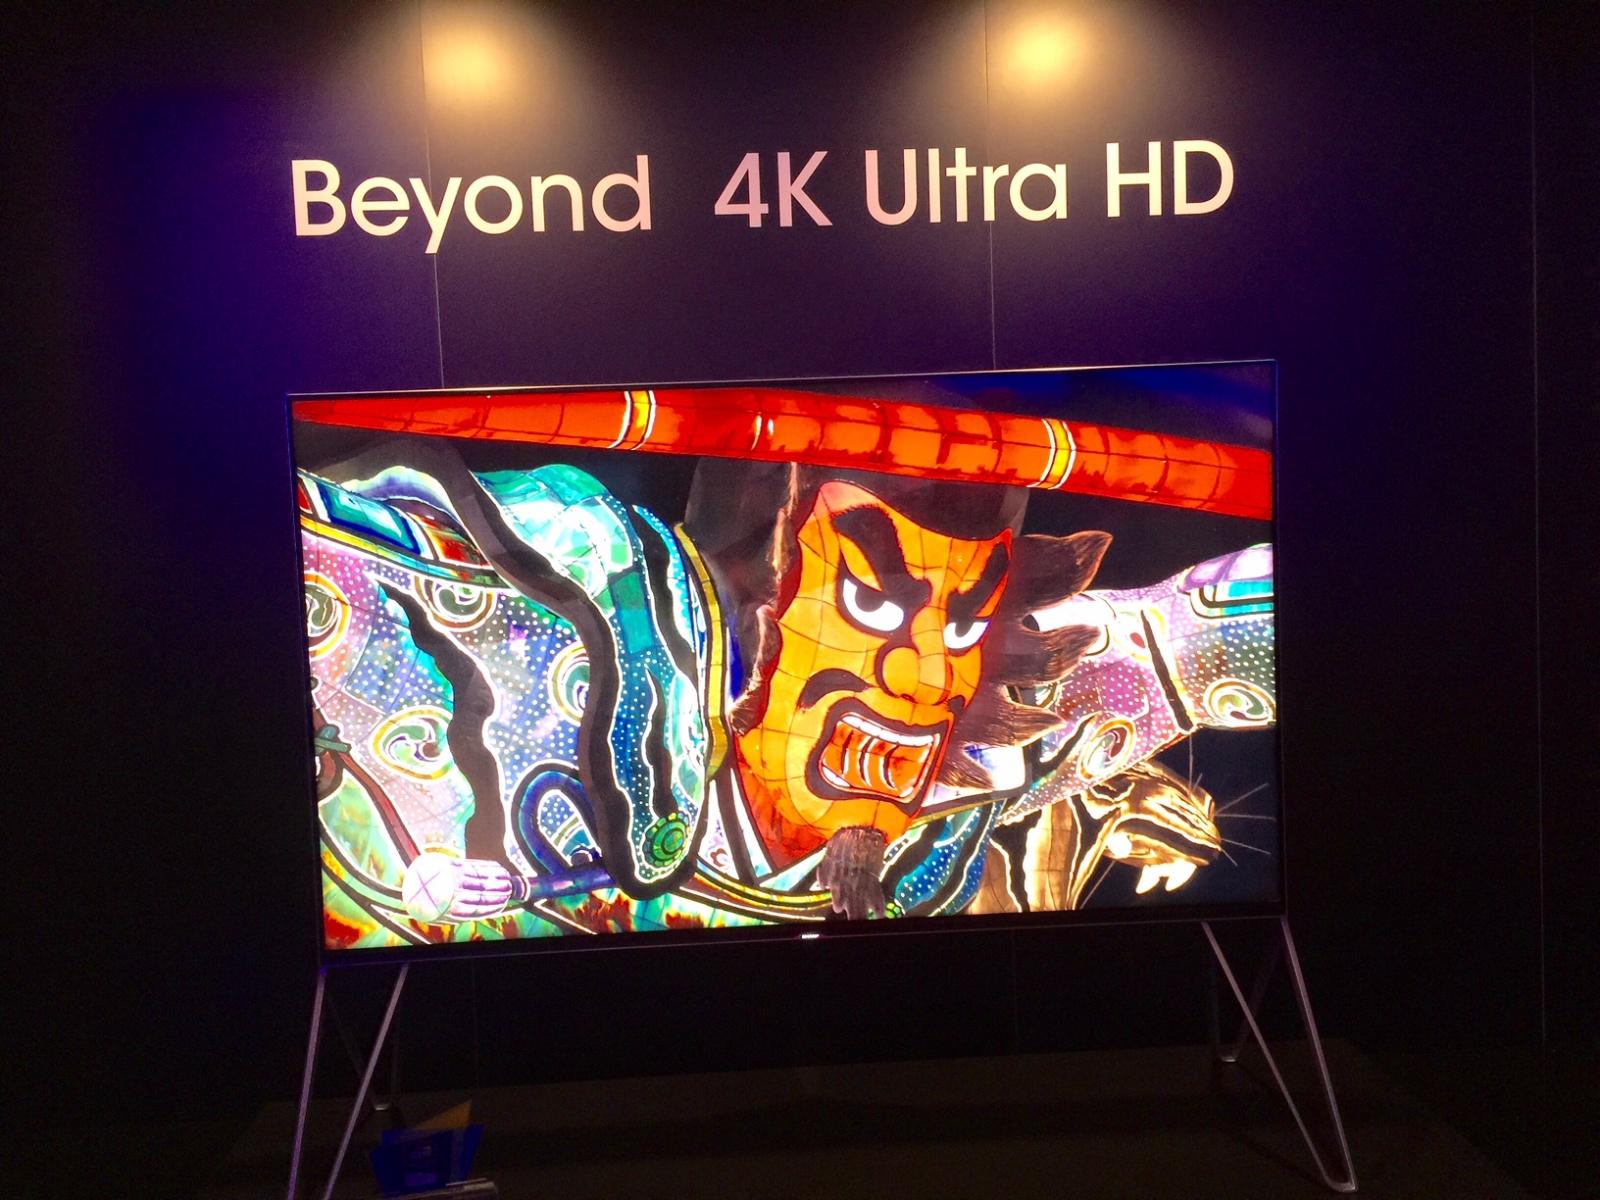 Sharp Aquos Beyond 4K Ultra HDTV